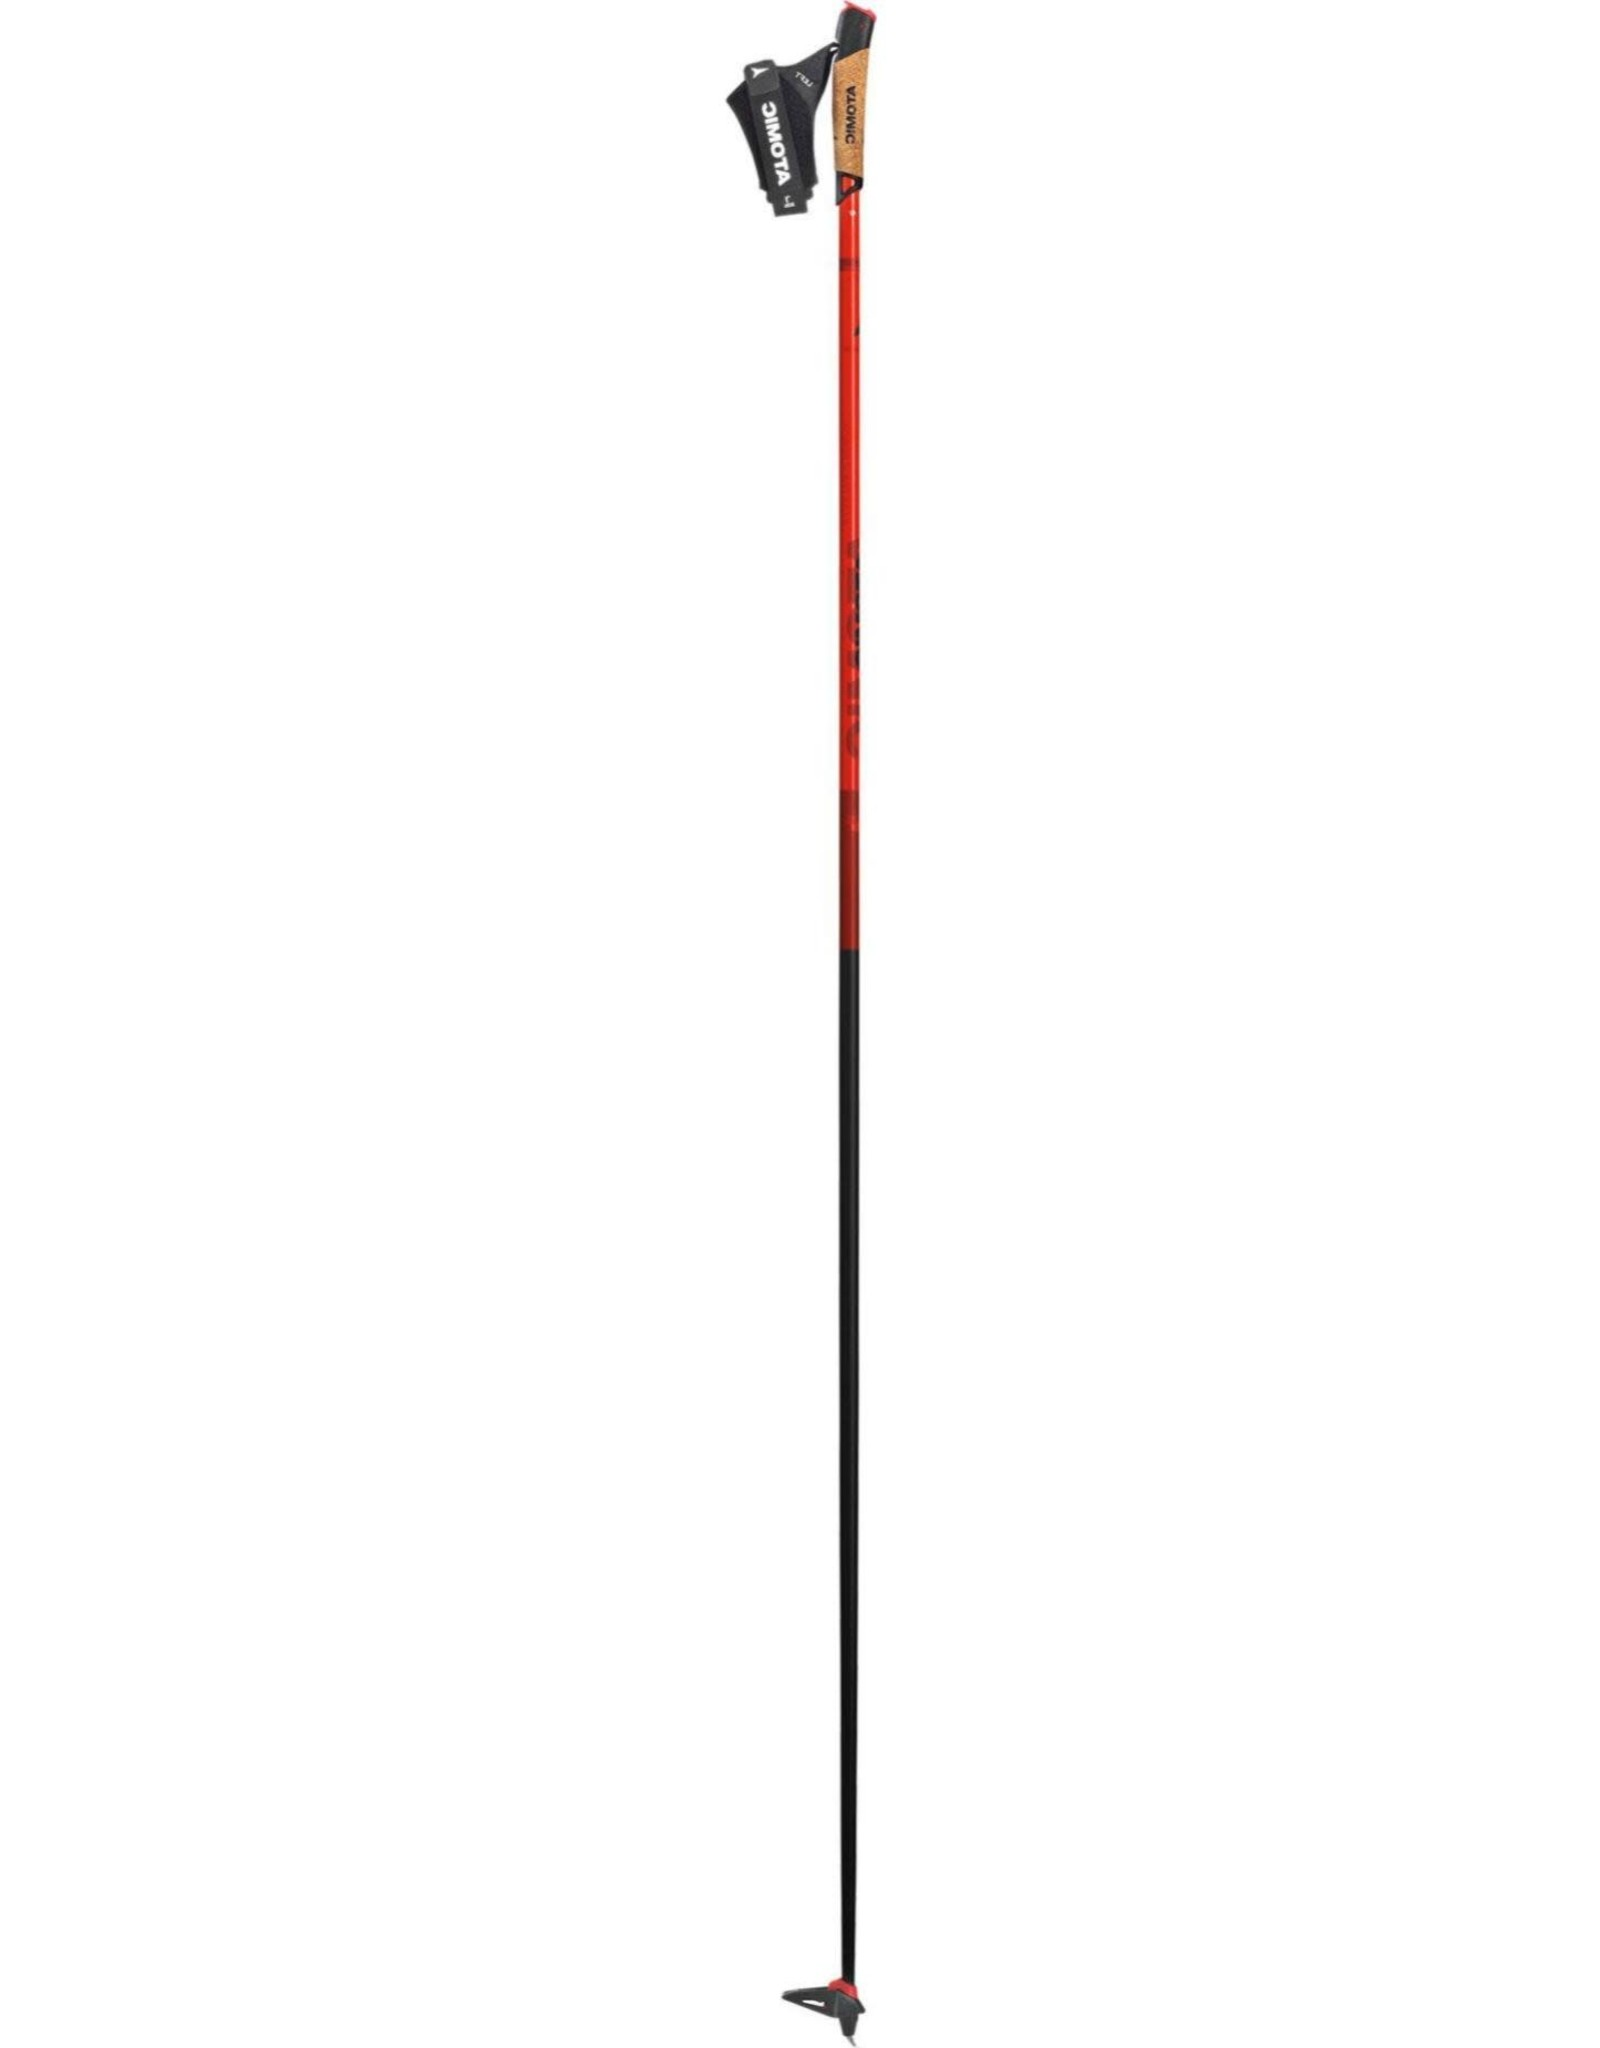 Atomic Atomic Redster Carbon QRS Pole